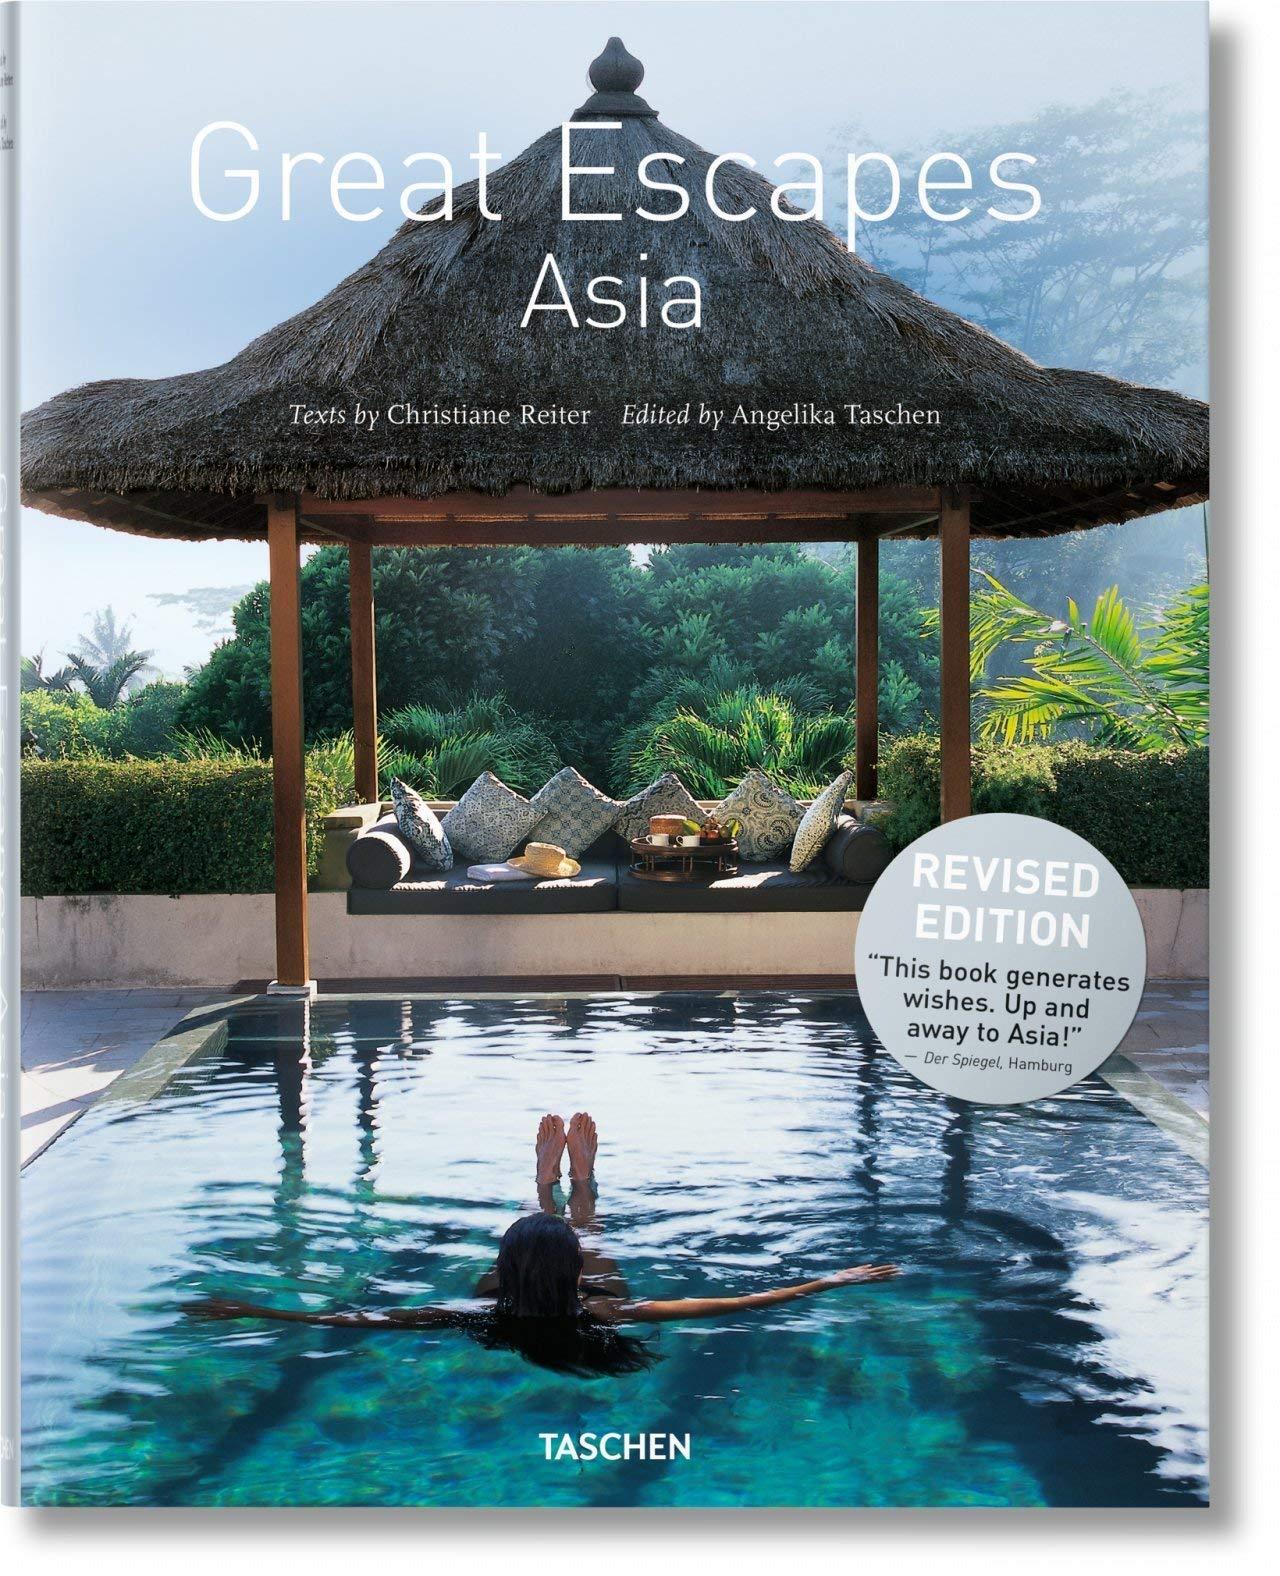 Great Escapes Asia. Updated Edition Jumbo Idioma Inglés: Amazon.es: Taschen, Angelika: Libros en idiomas extranjeros